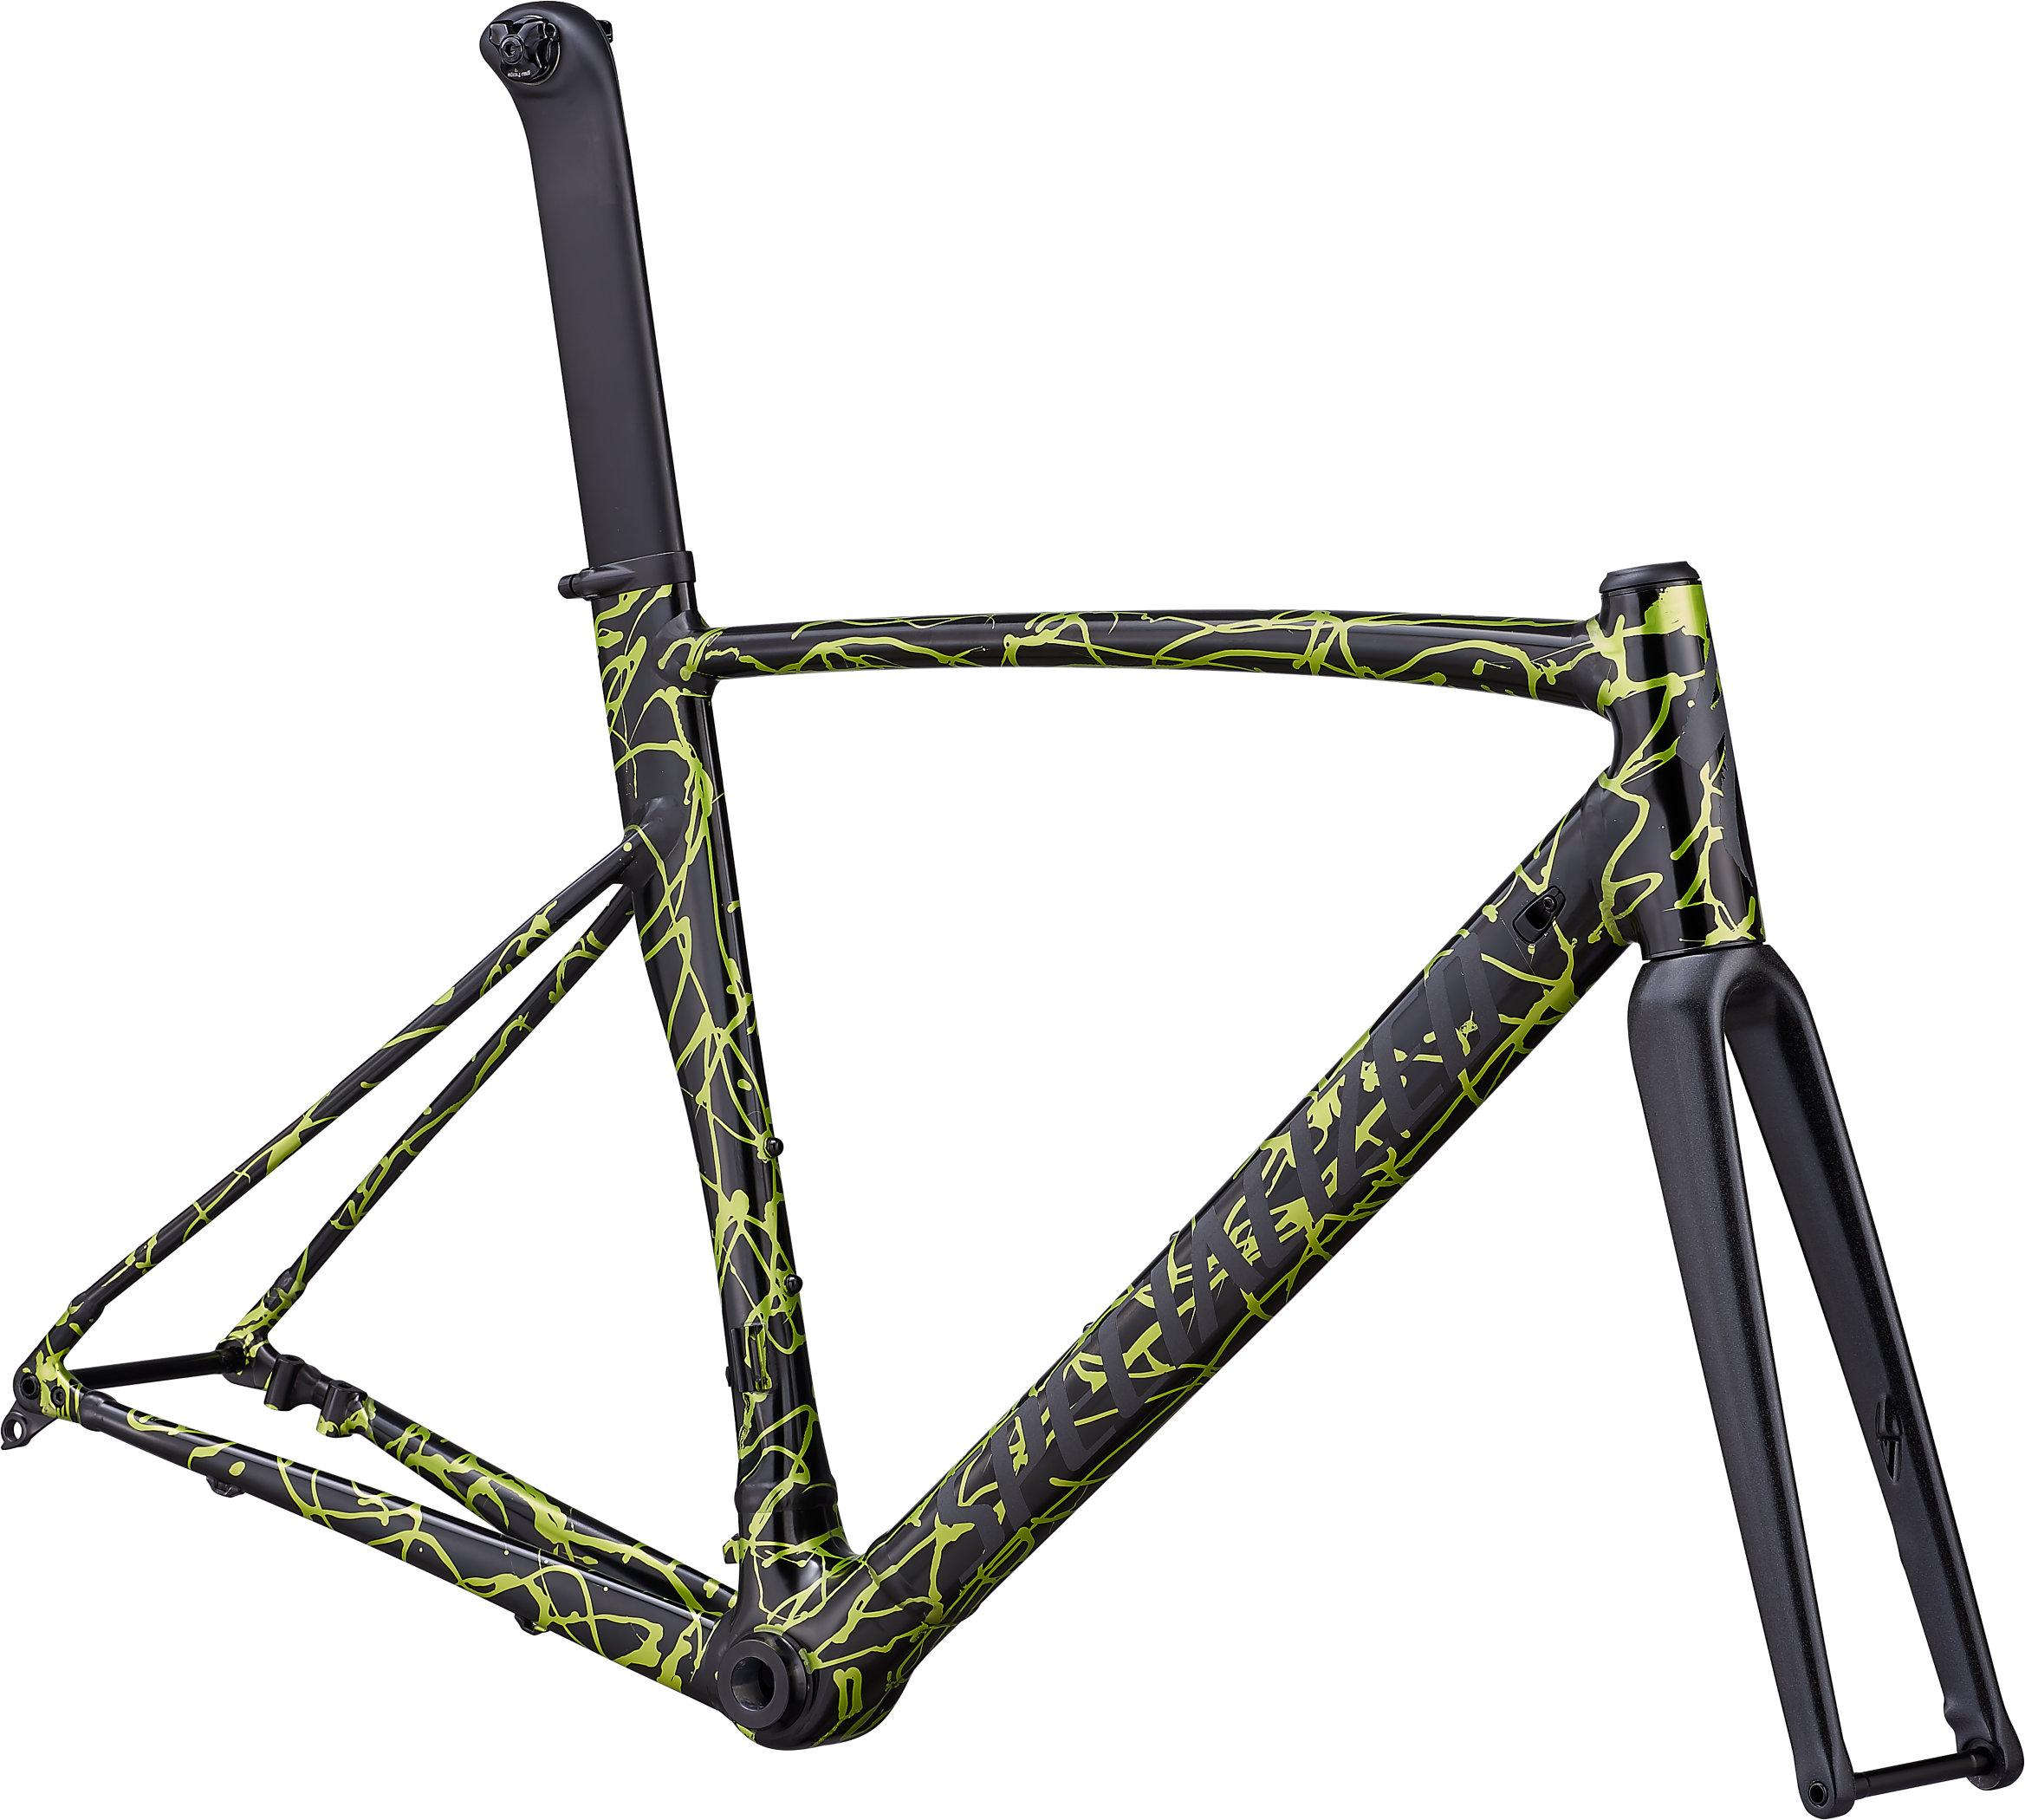 Specialized Allez Sprint Disc Frameset Satin Splash Anodized/Satin Reflective/Clean 49 - Pulsschlag Bike+Sport